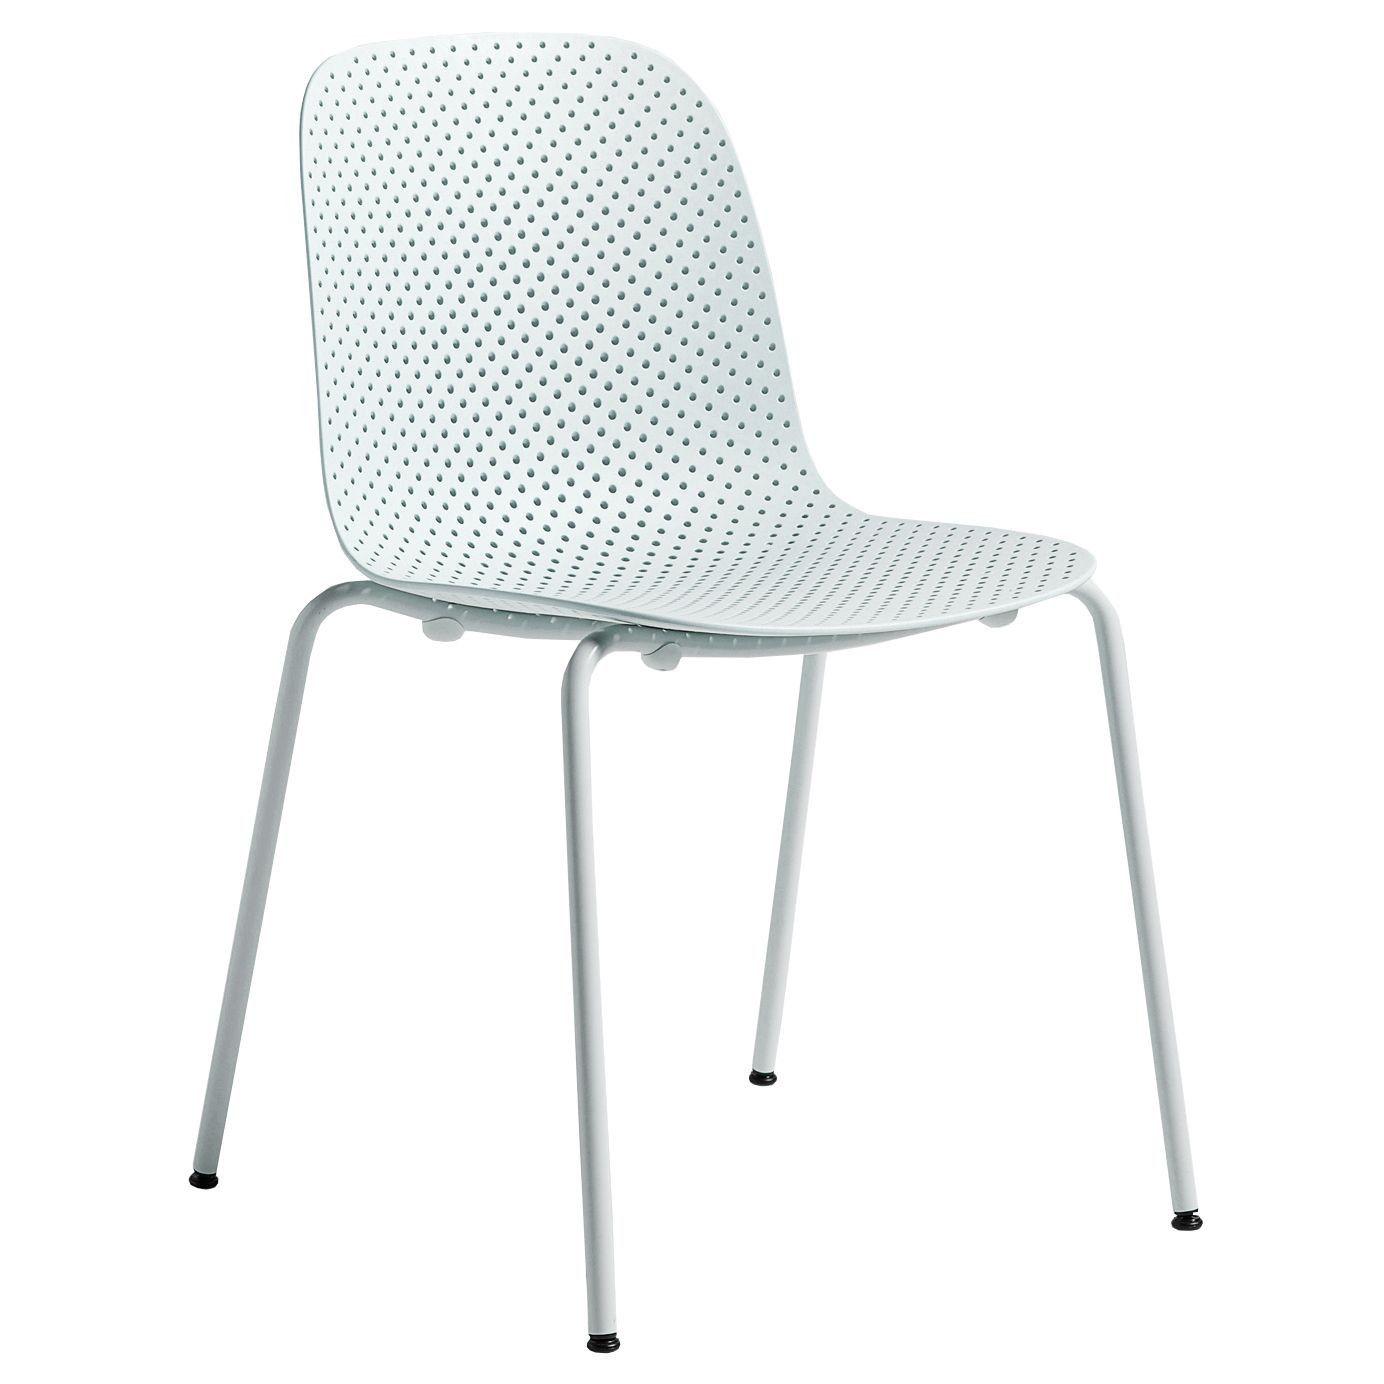 Marvelous Hay 13Eighty Chair Tuinstoel Pdpeps Interior Chair Design Pdpepsorg